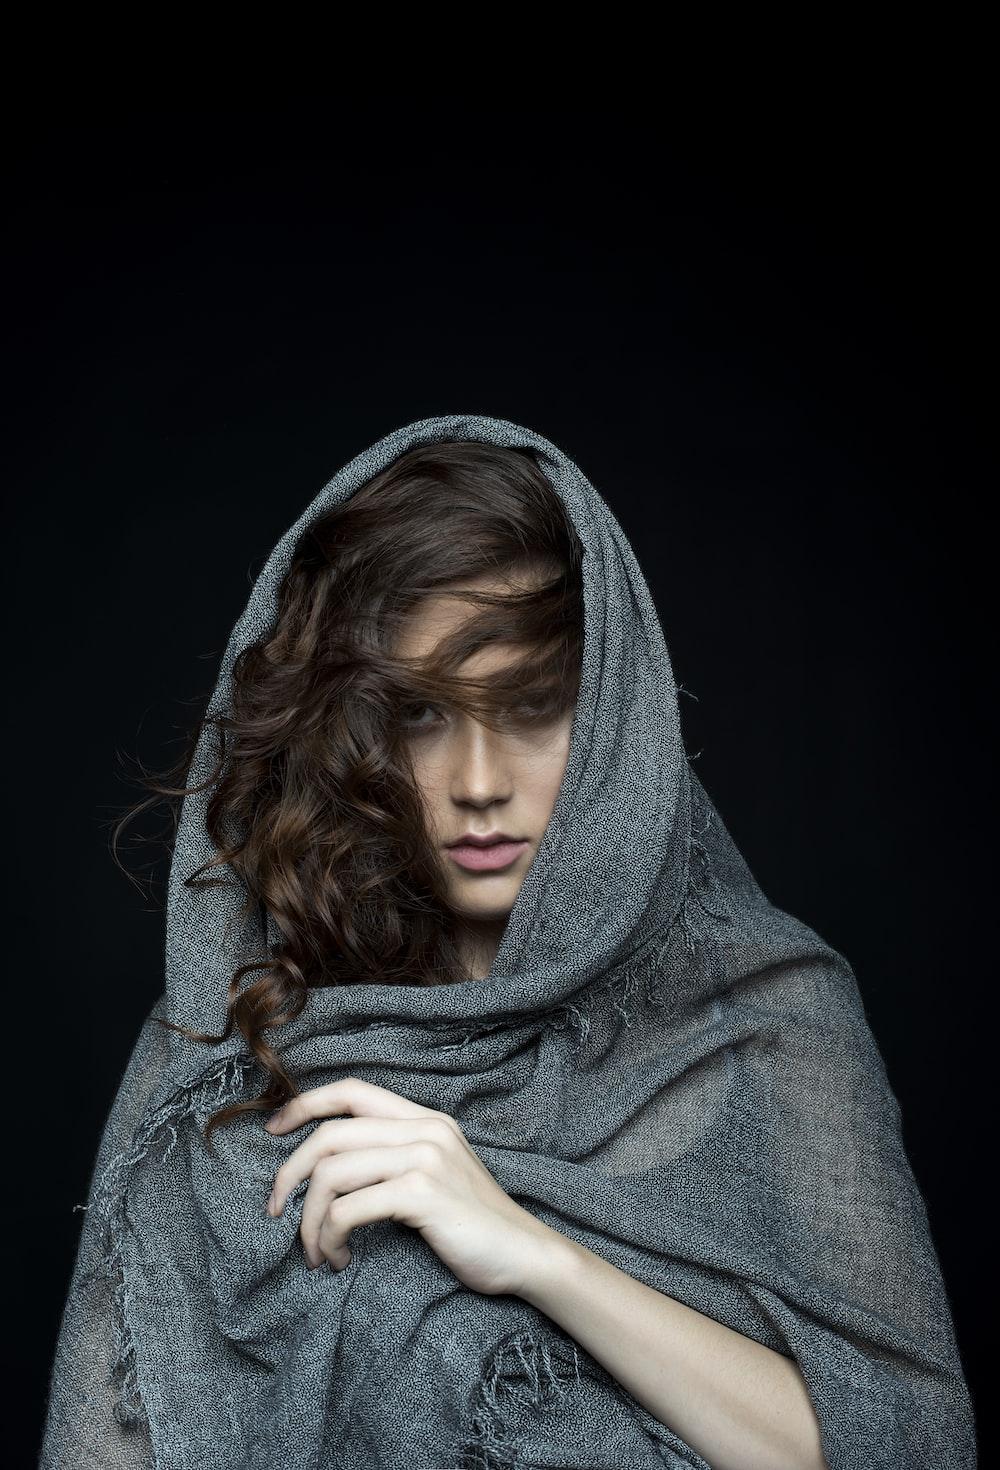 woman wearing black scarf